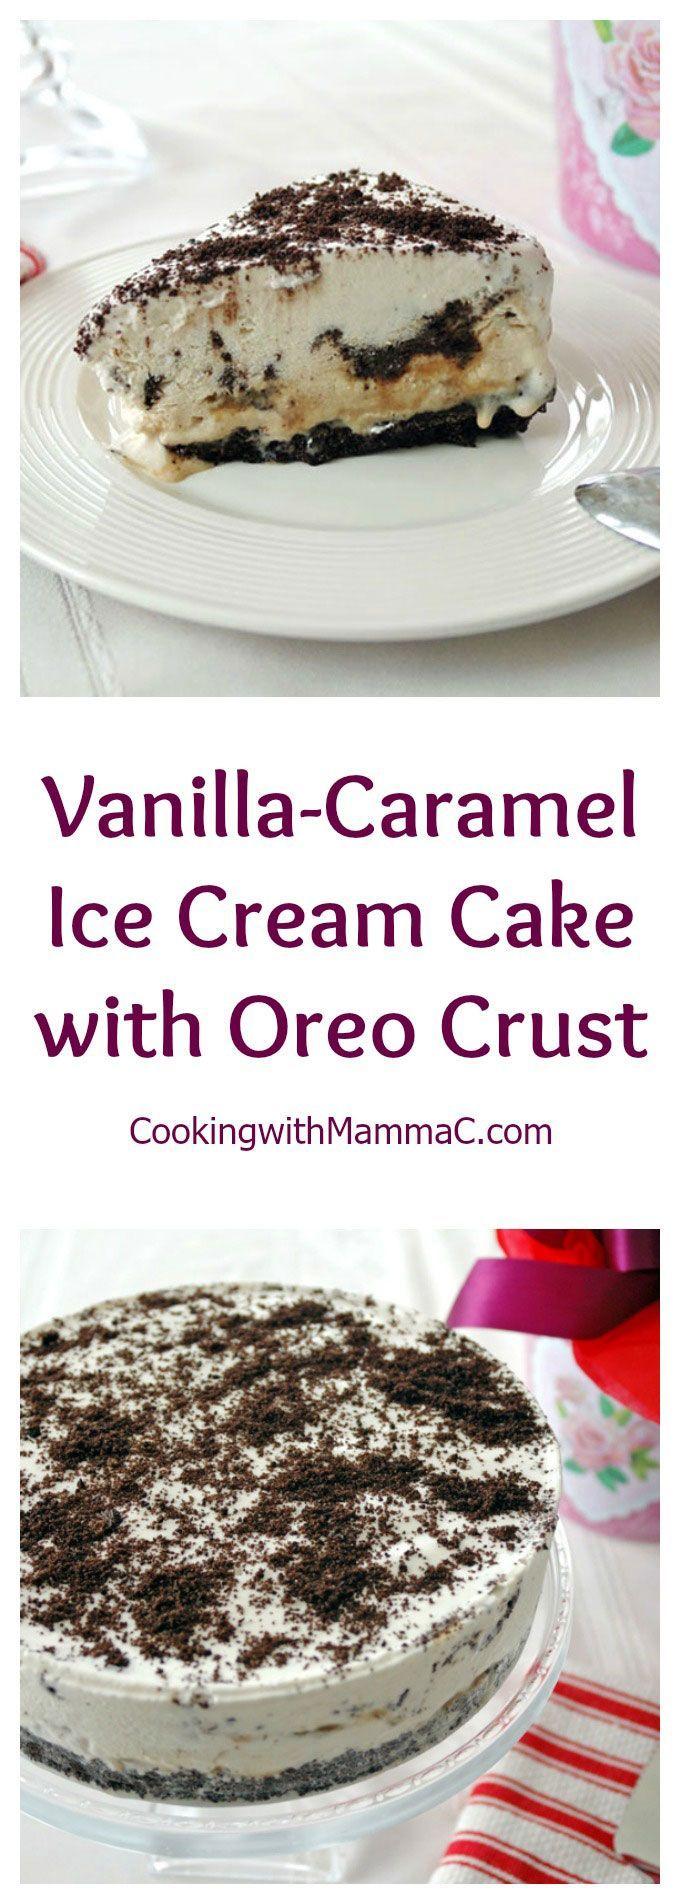 Vanilla-Caramel Ice Cream Cake with Oreo Crust - A family favorite with homemade…